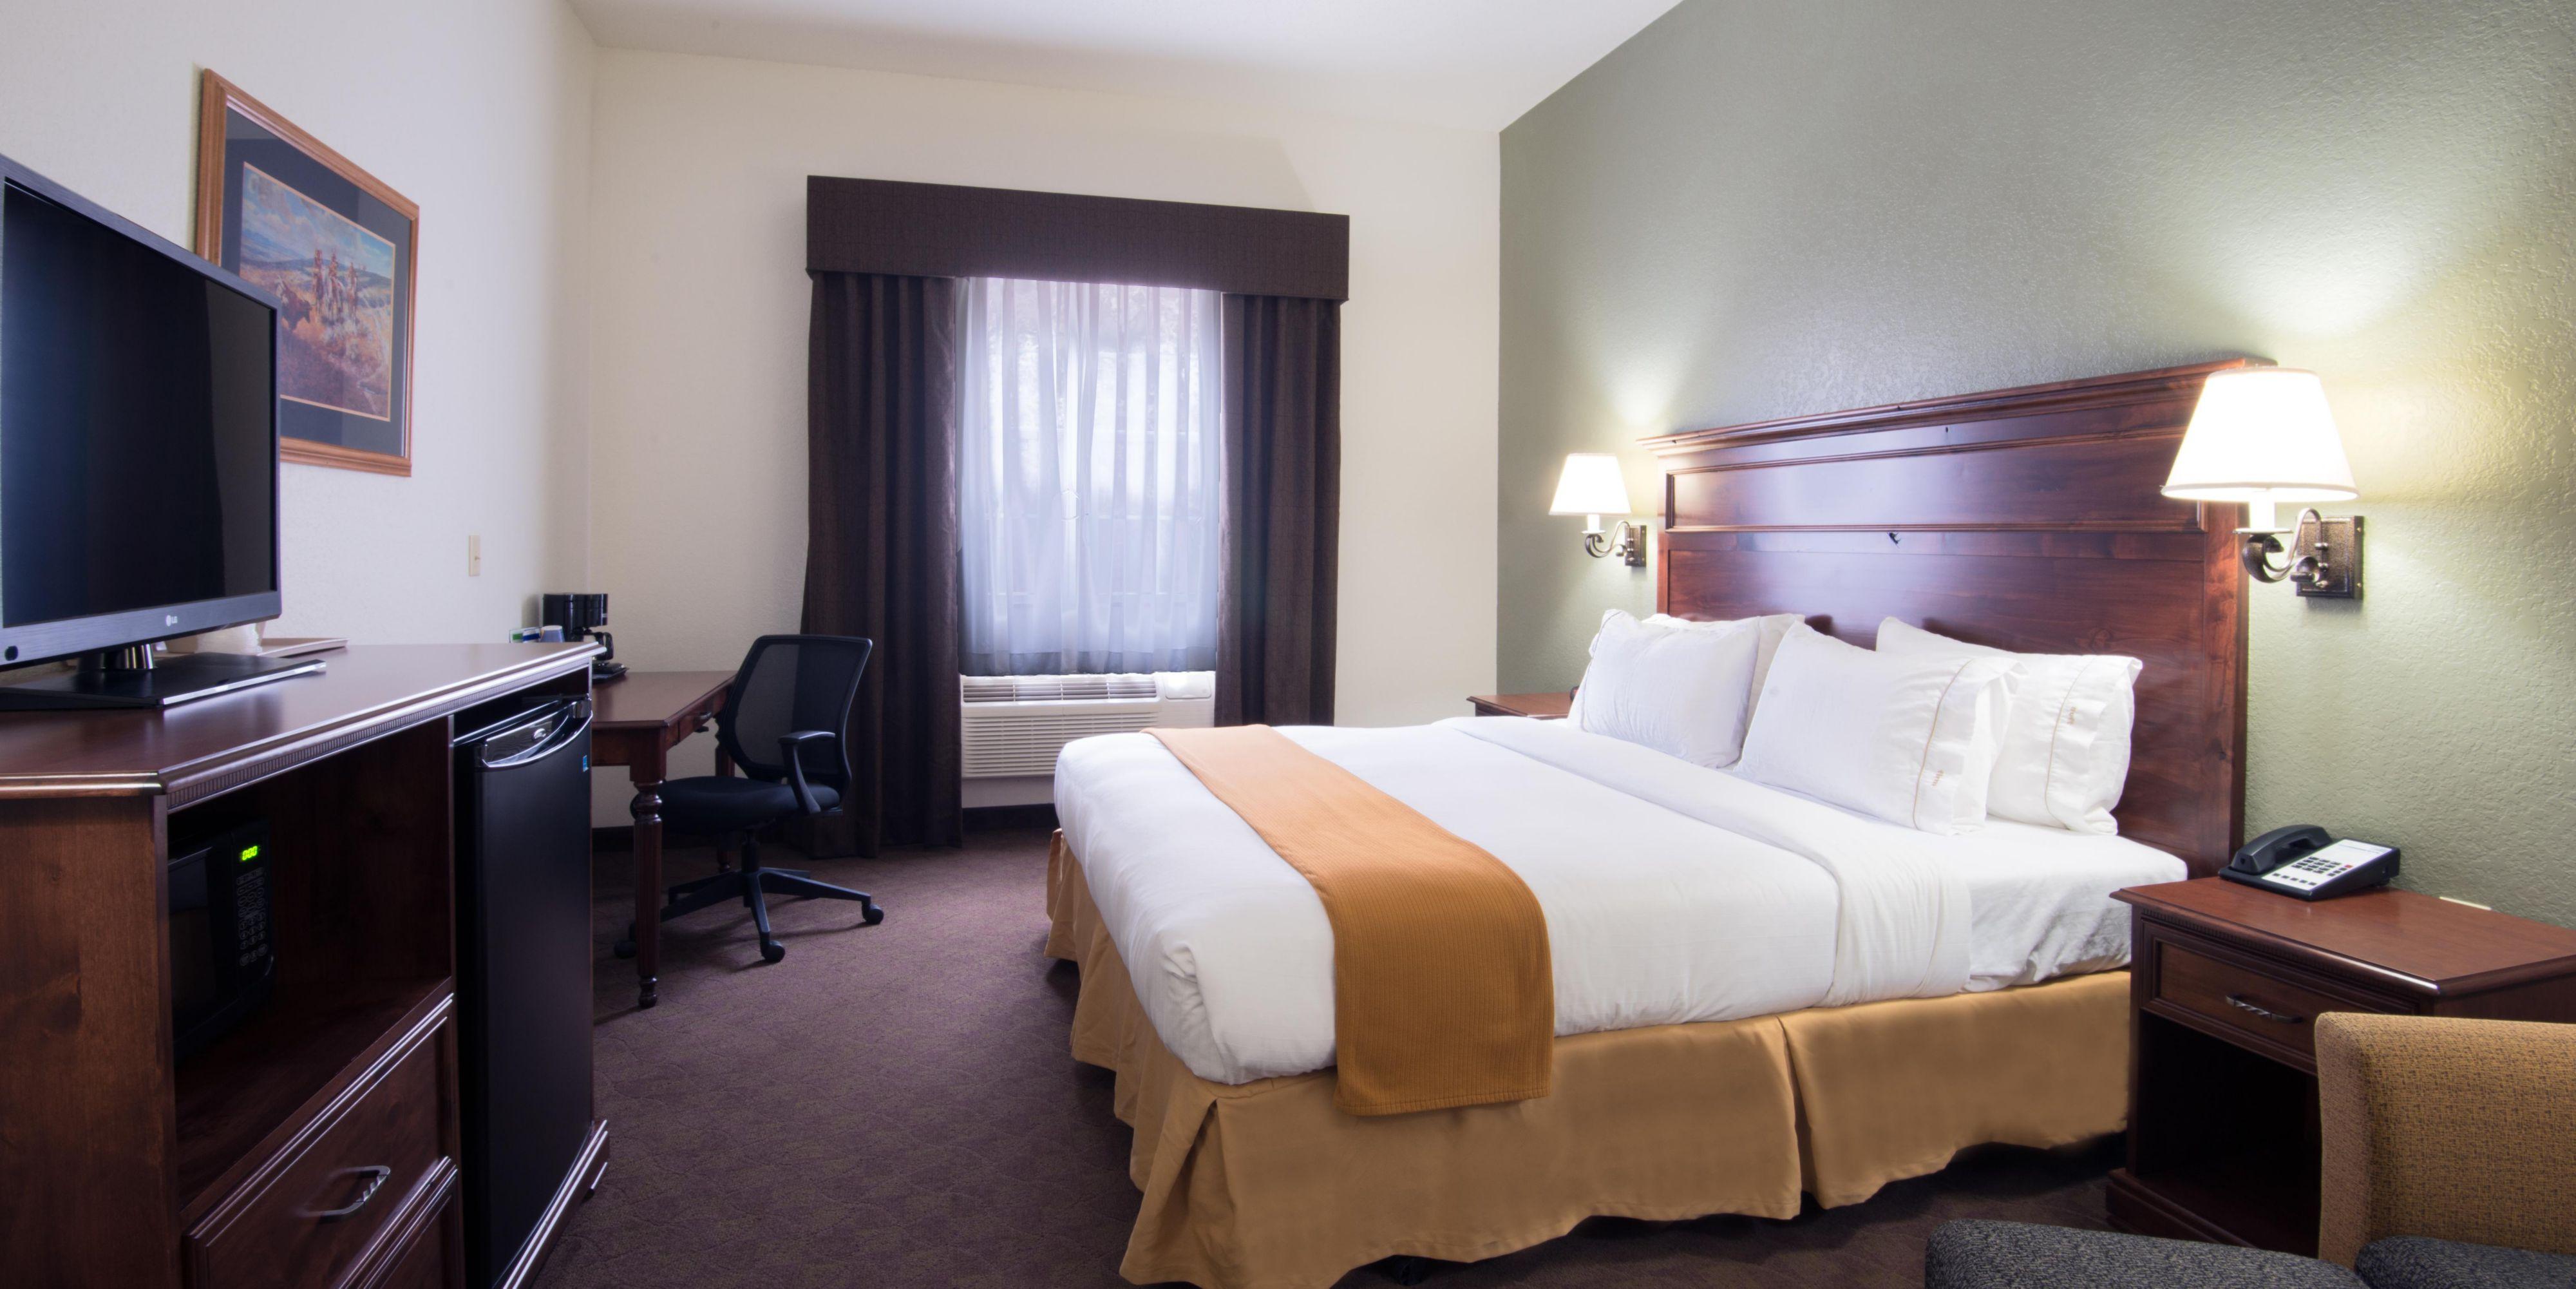 holiday inn express suites keystone hotel by ihg